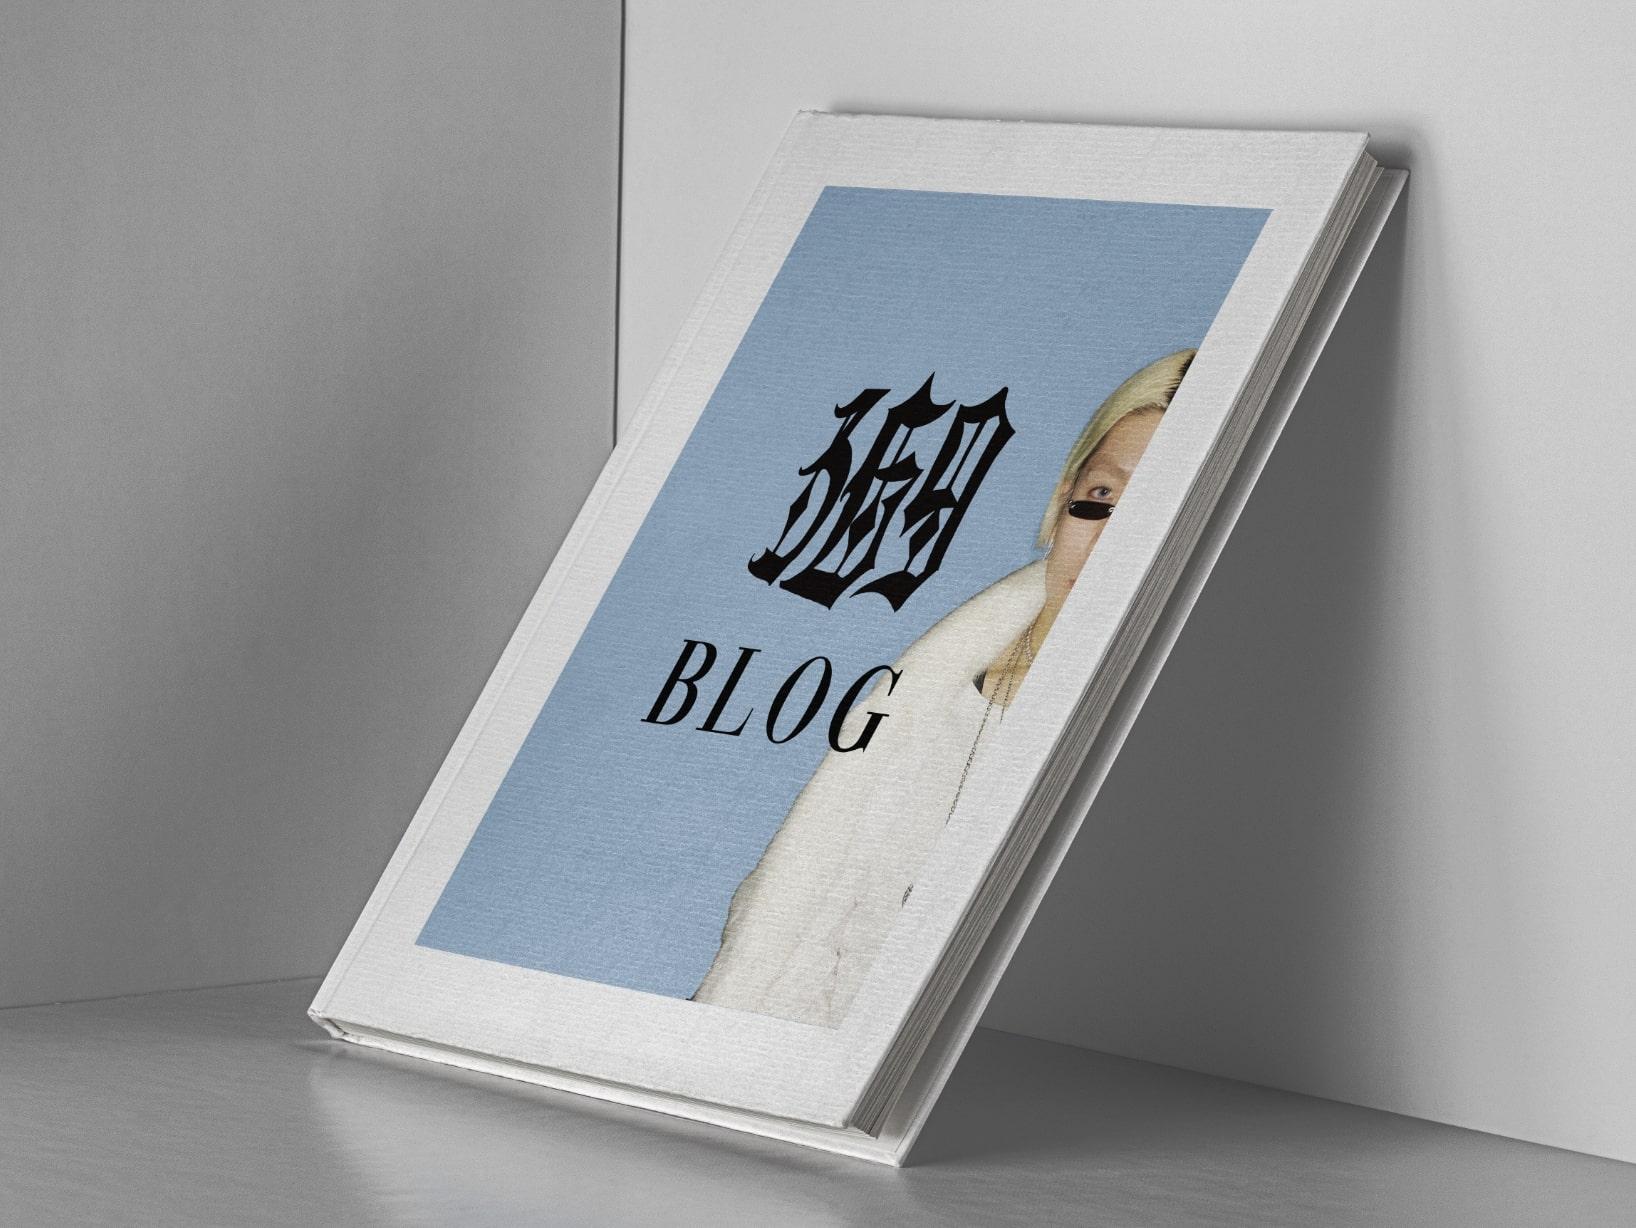 369blog|ART